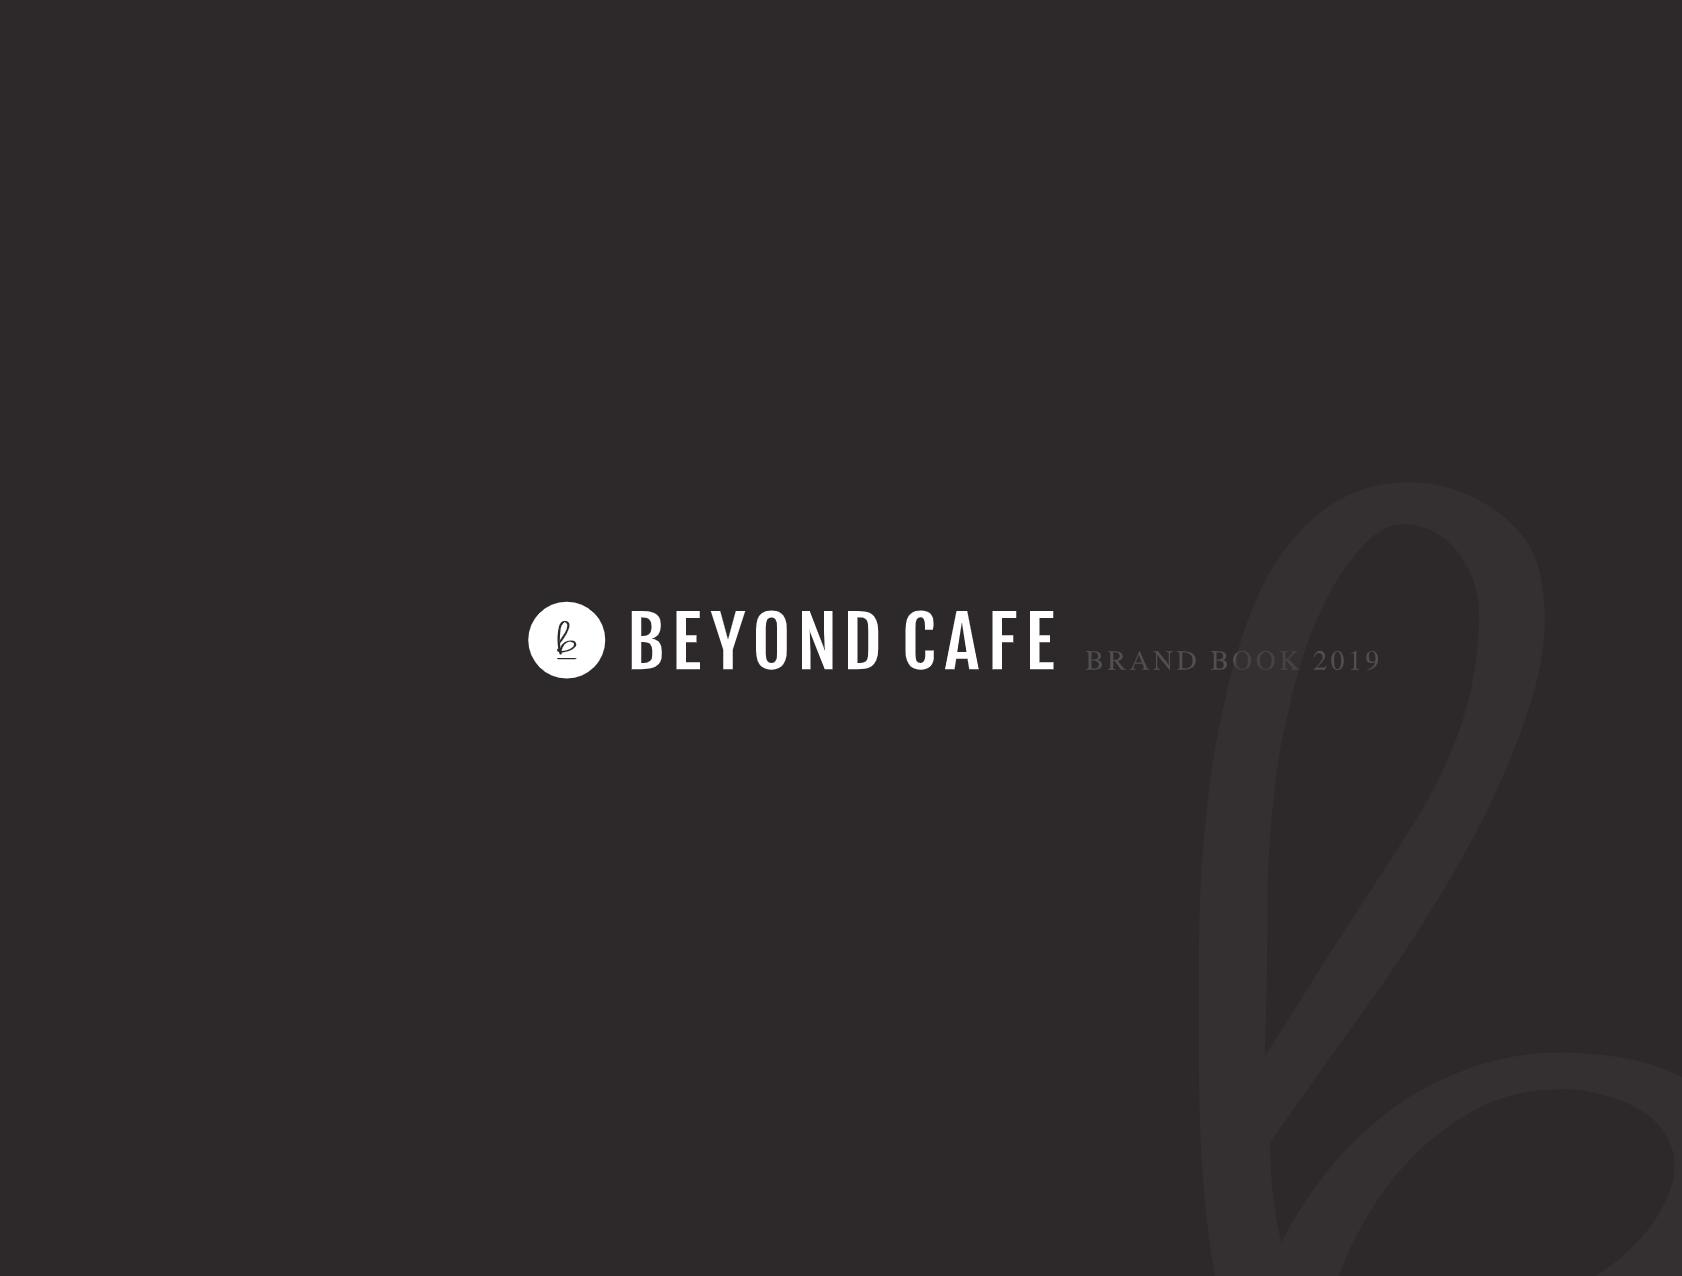 Beyond Cafe ブランドブック